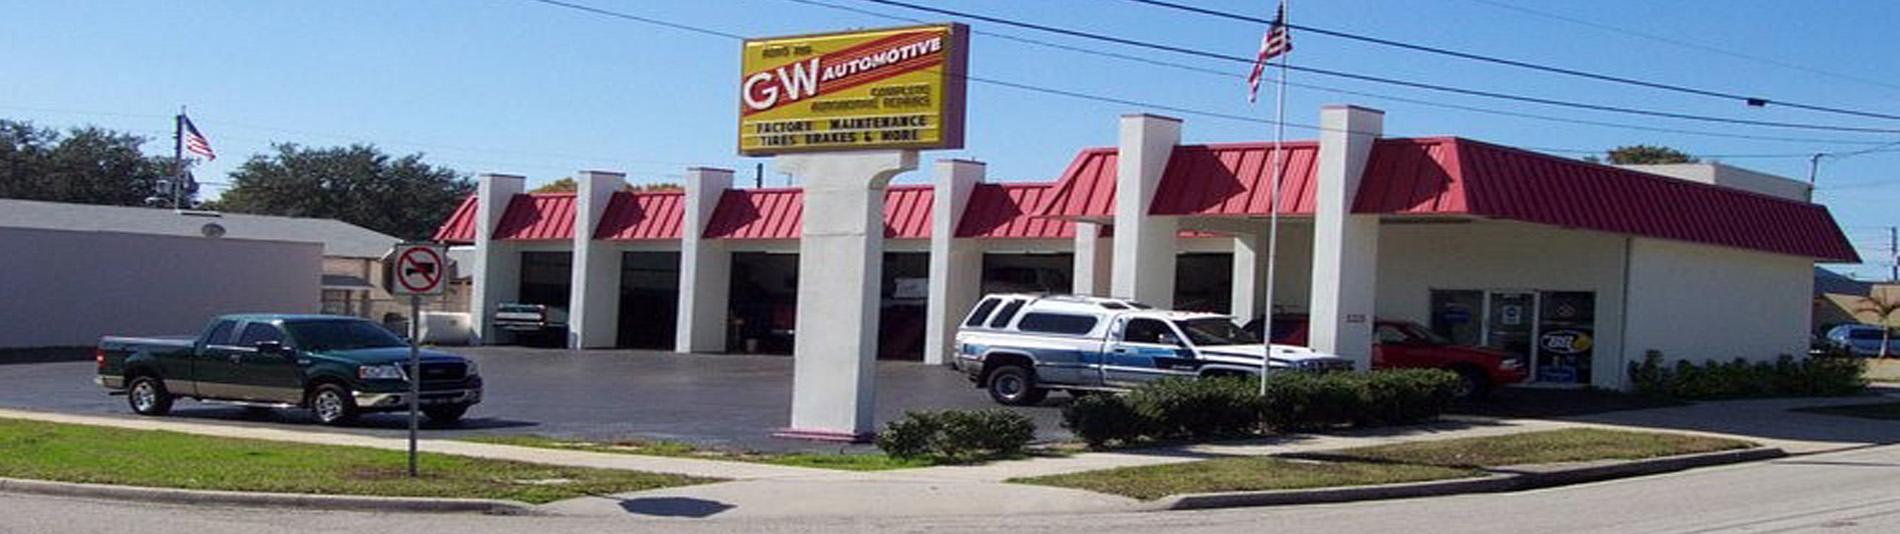 Gw Automotive Inc Expert Auto Repair Clearwater Fl 33756